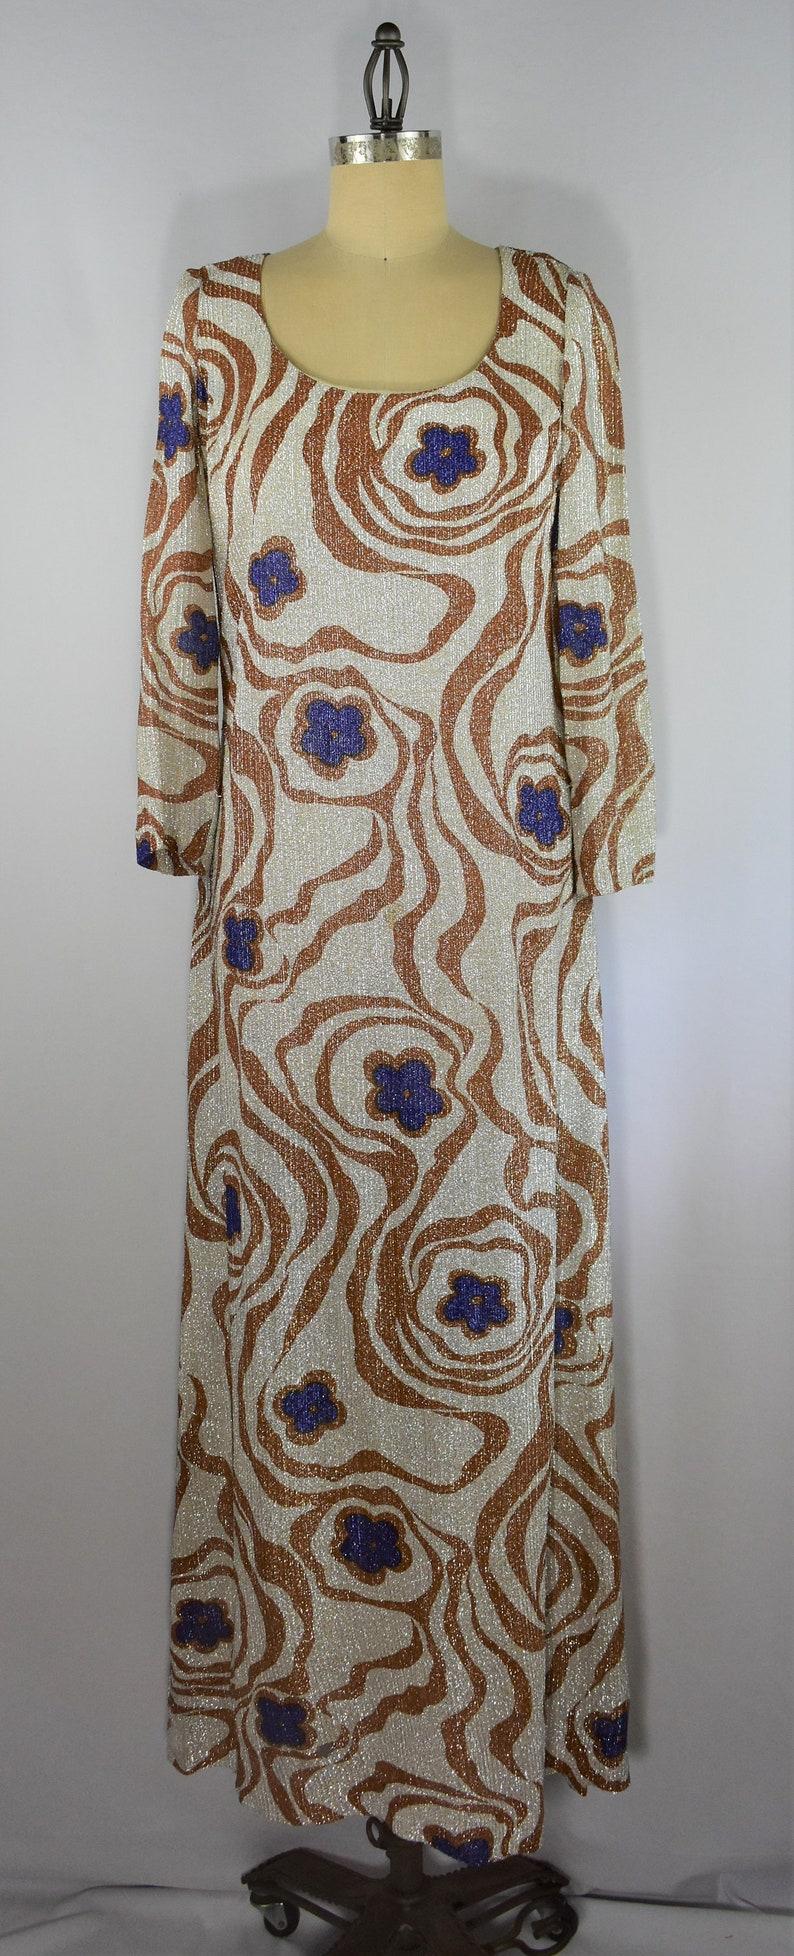 2338d605bf4 Long Sleeve Geo Print Maxi Dress   Saddha